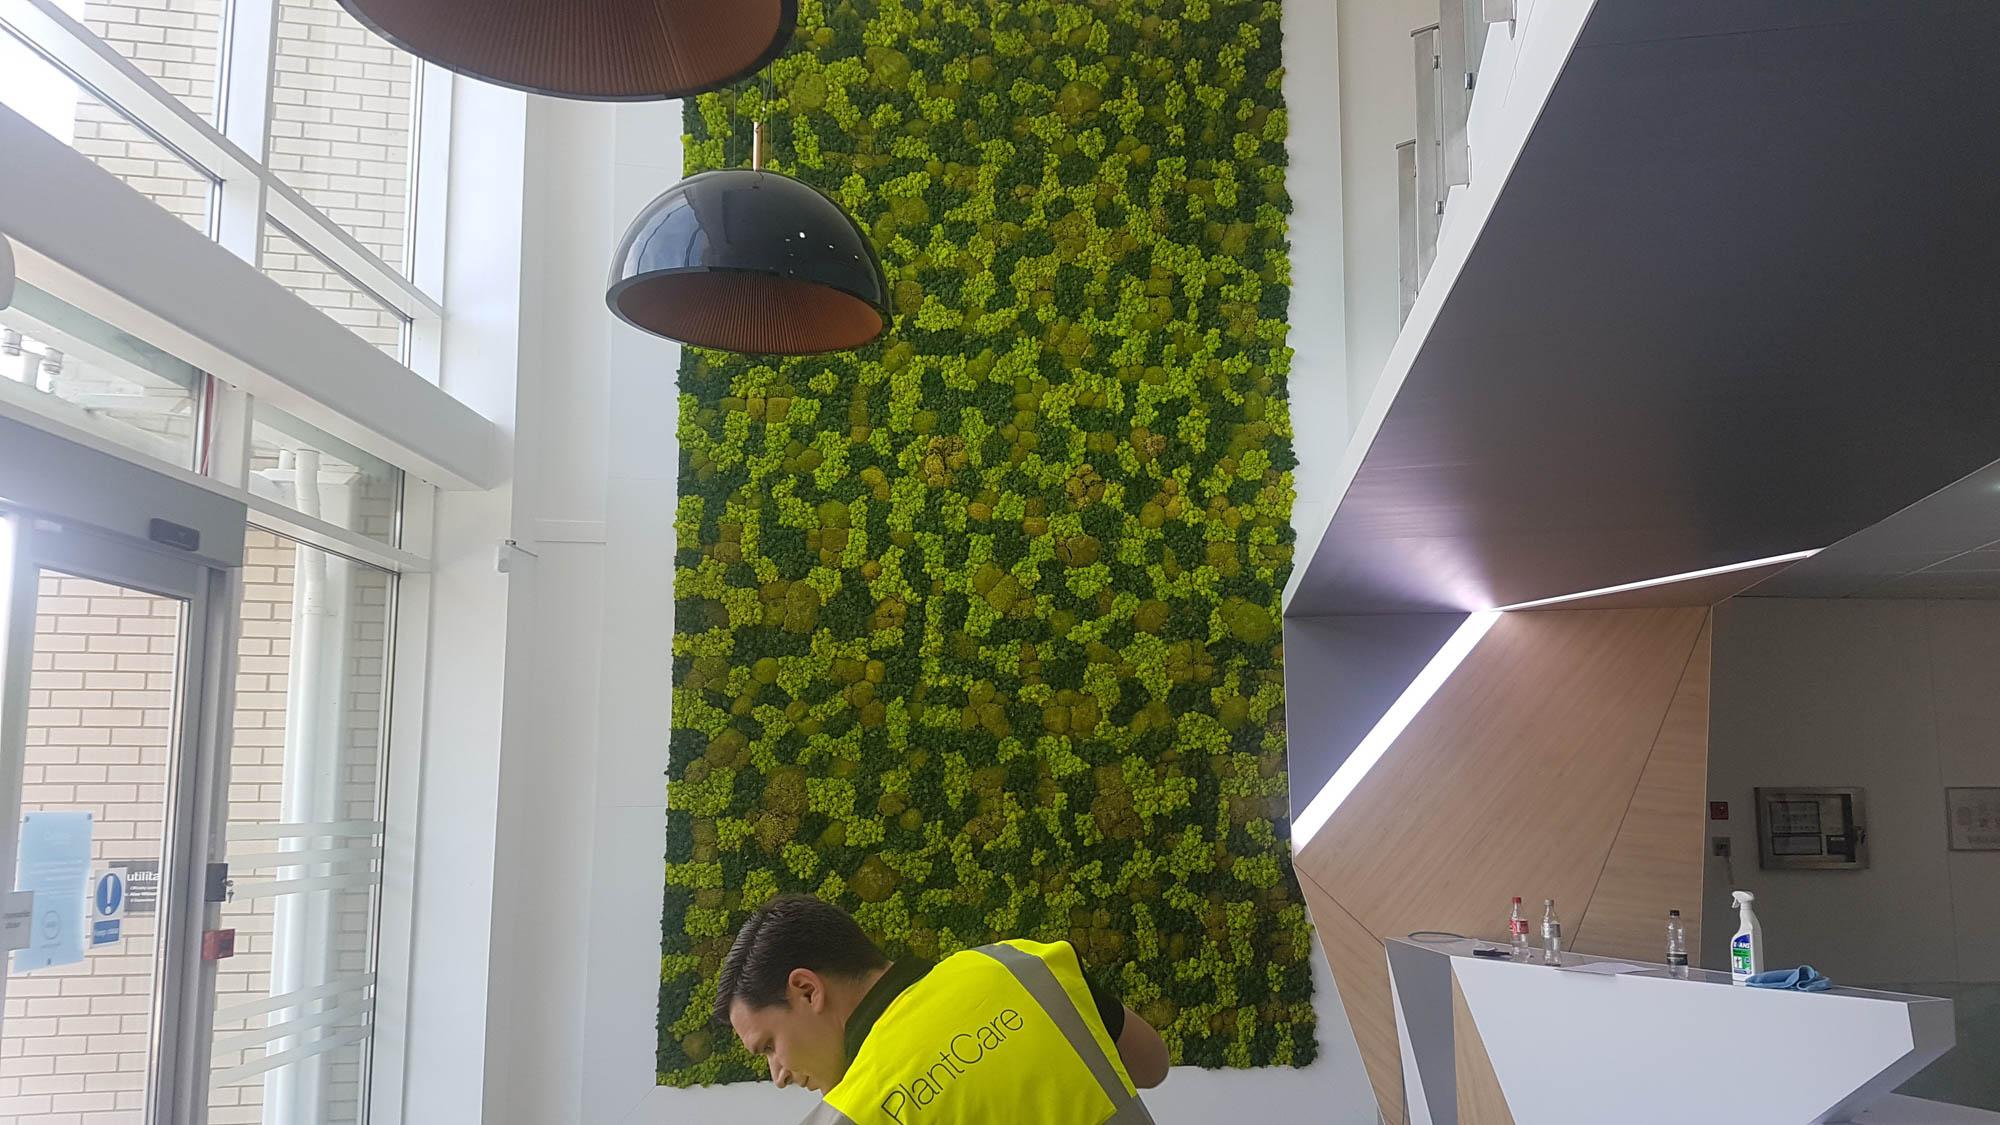 utilita-mosswall-bespoke-custom-plantcare-bristol-image-2